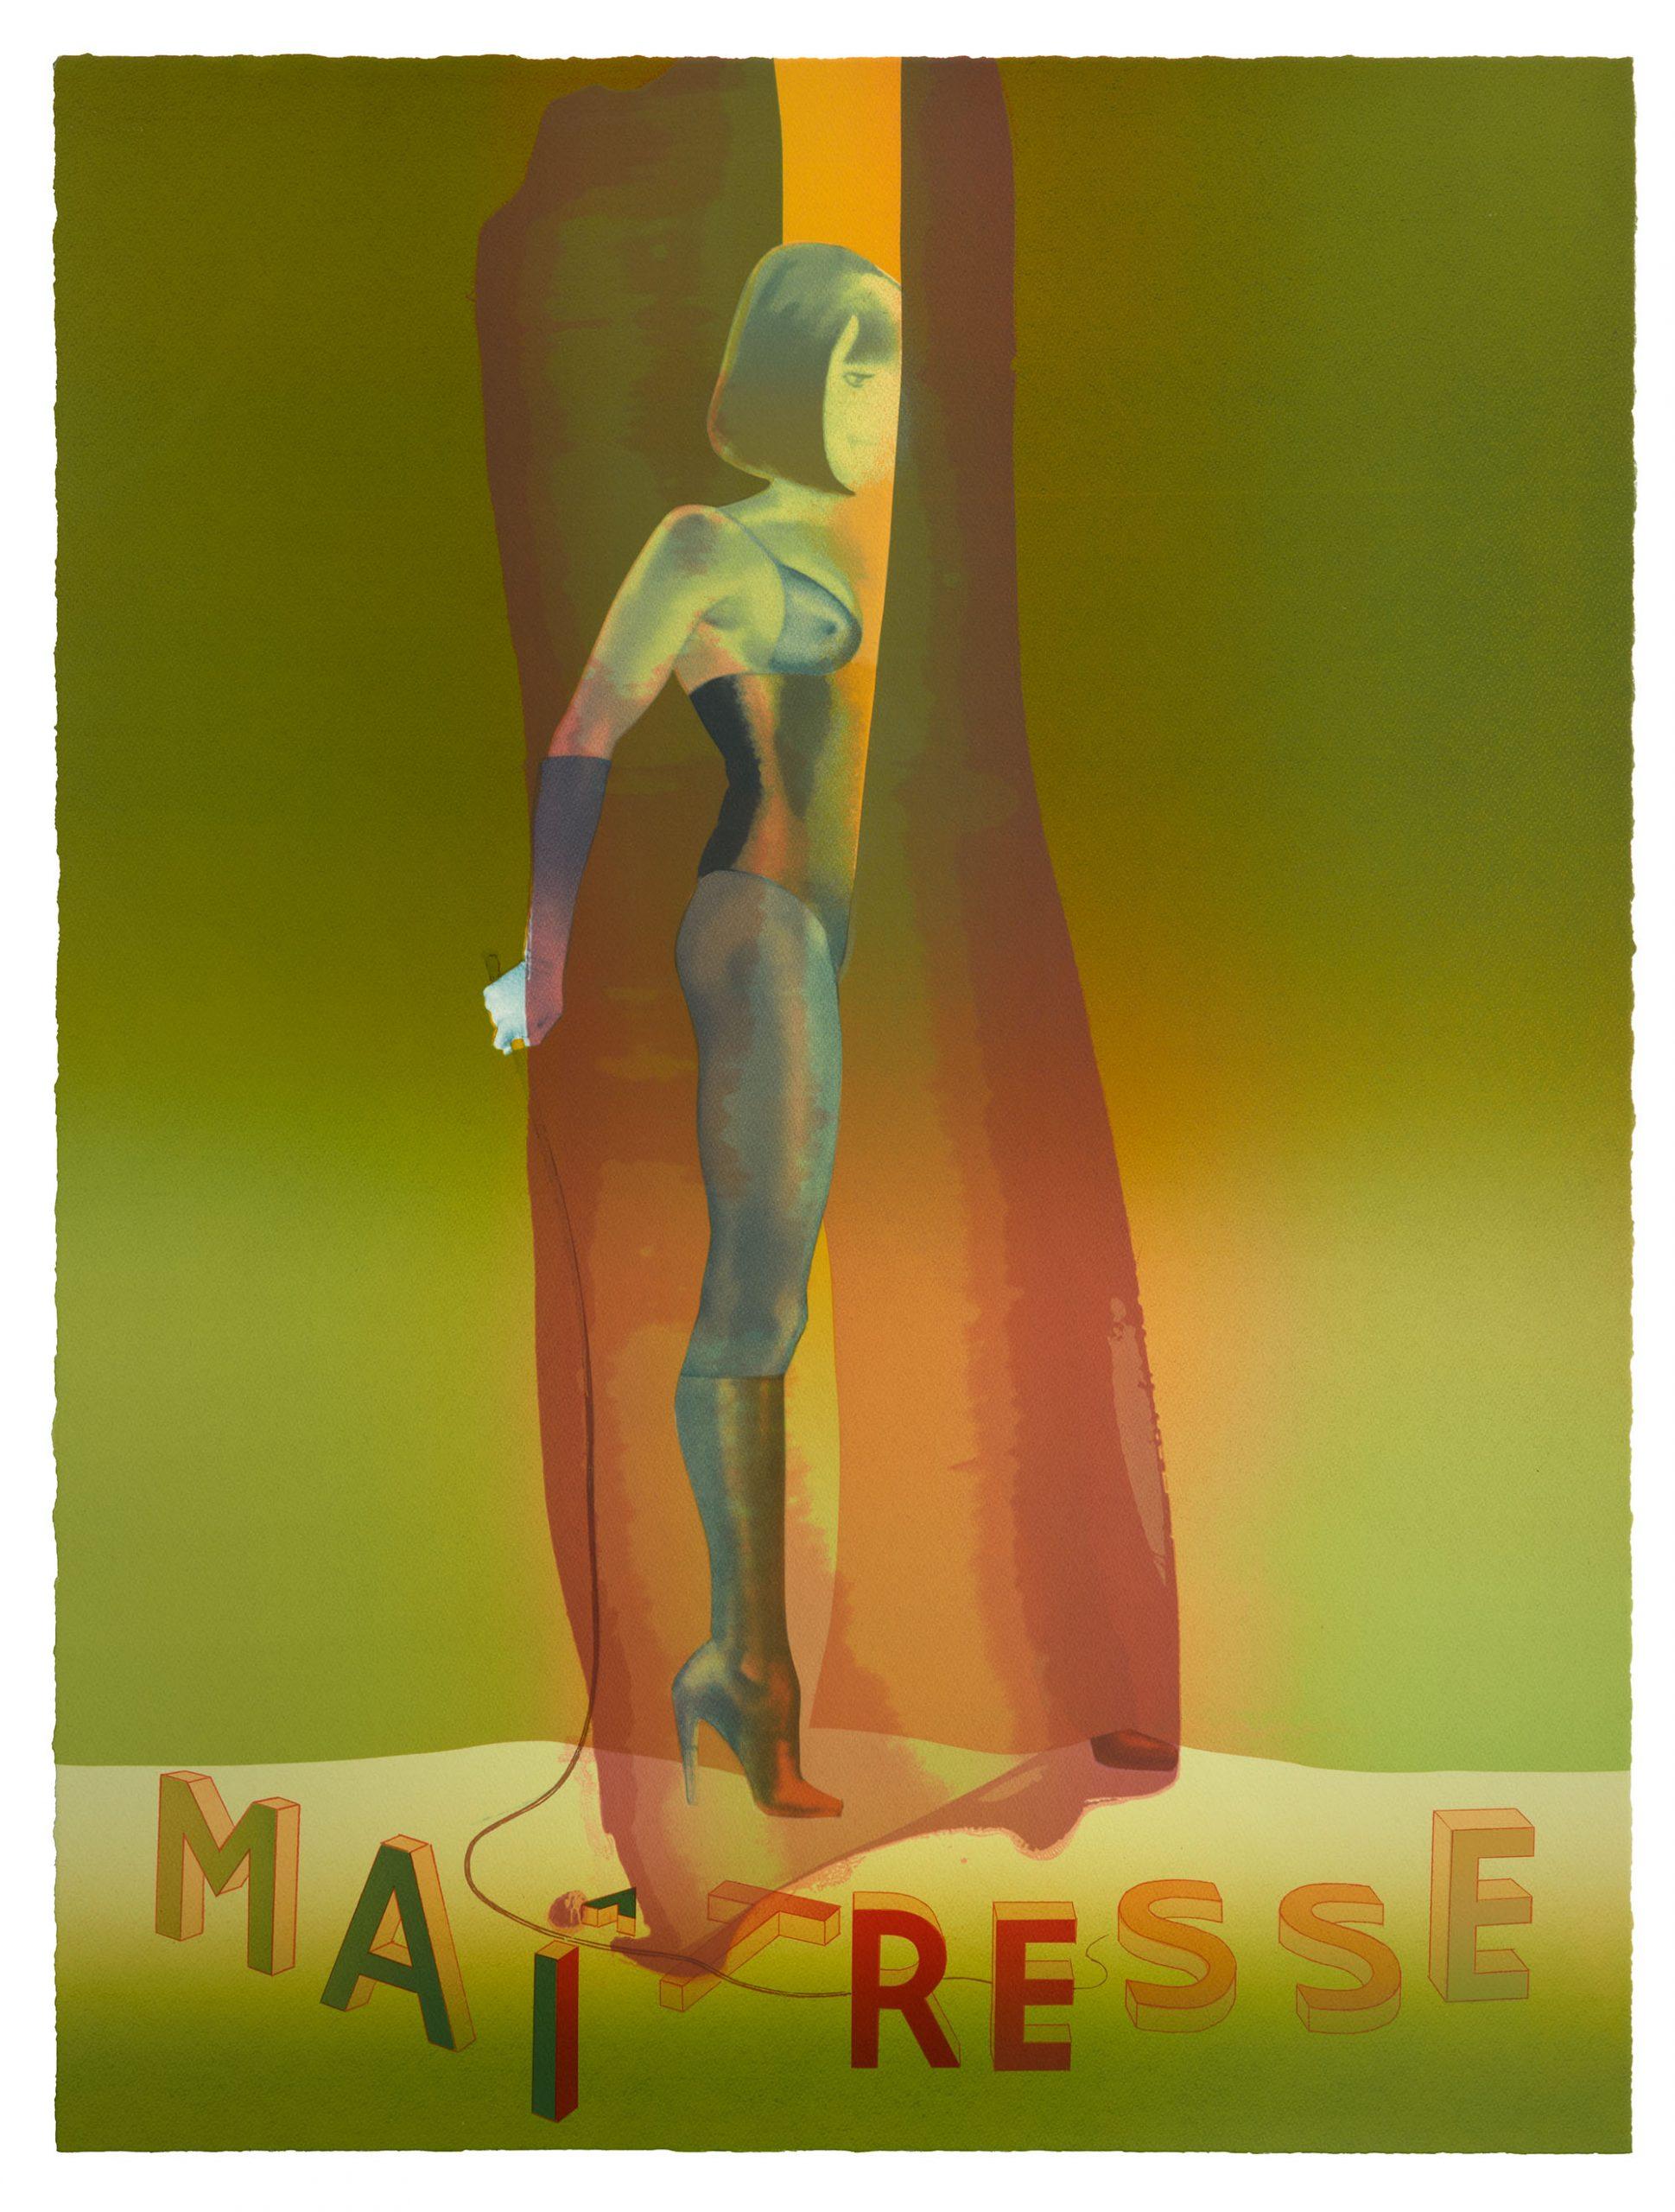 Maitresse Folio Screenprint Ii by Allen Jones